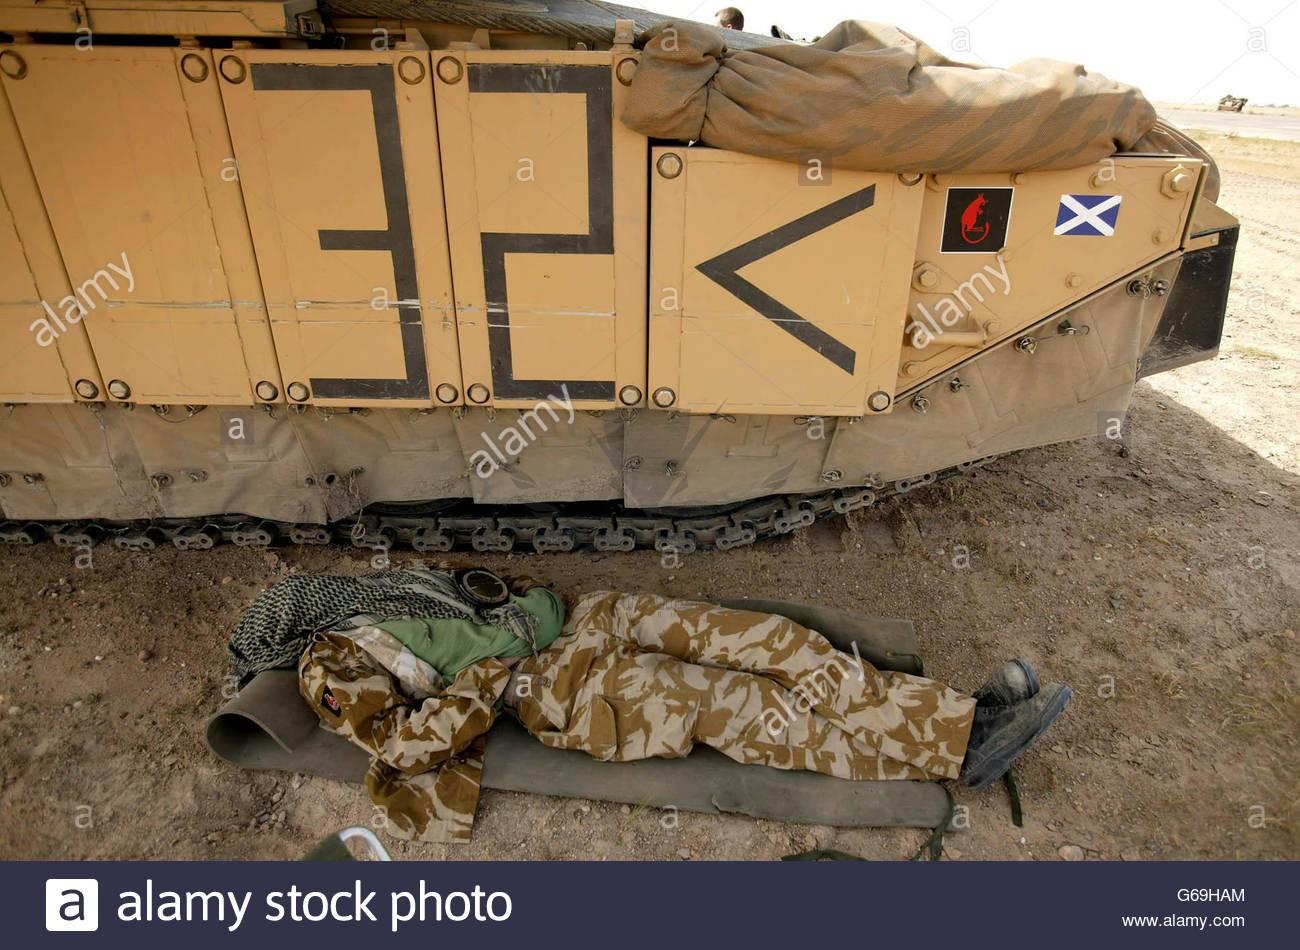 iraq-war-challenger-2-tank-crew-G69HAM.jpg